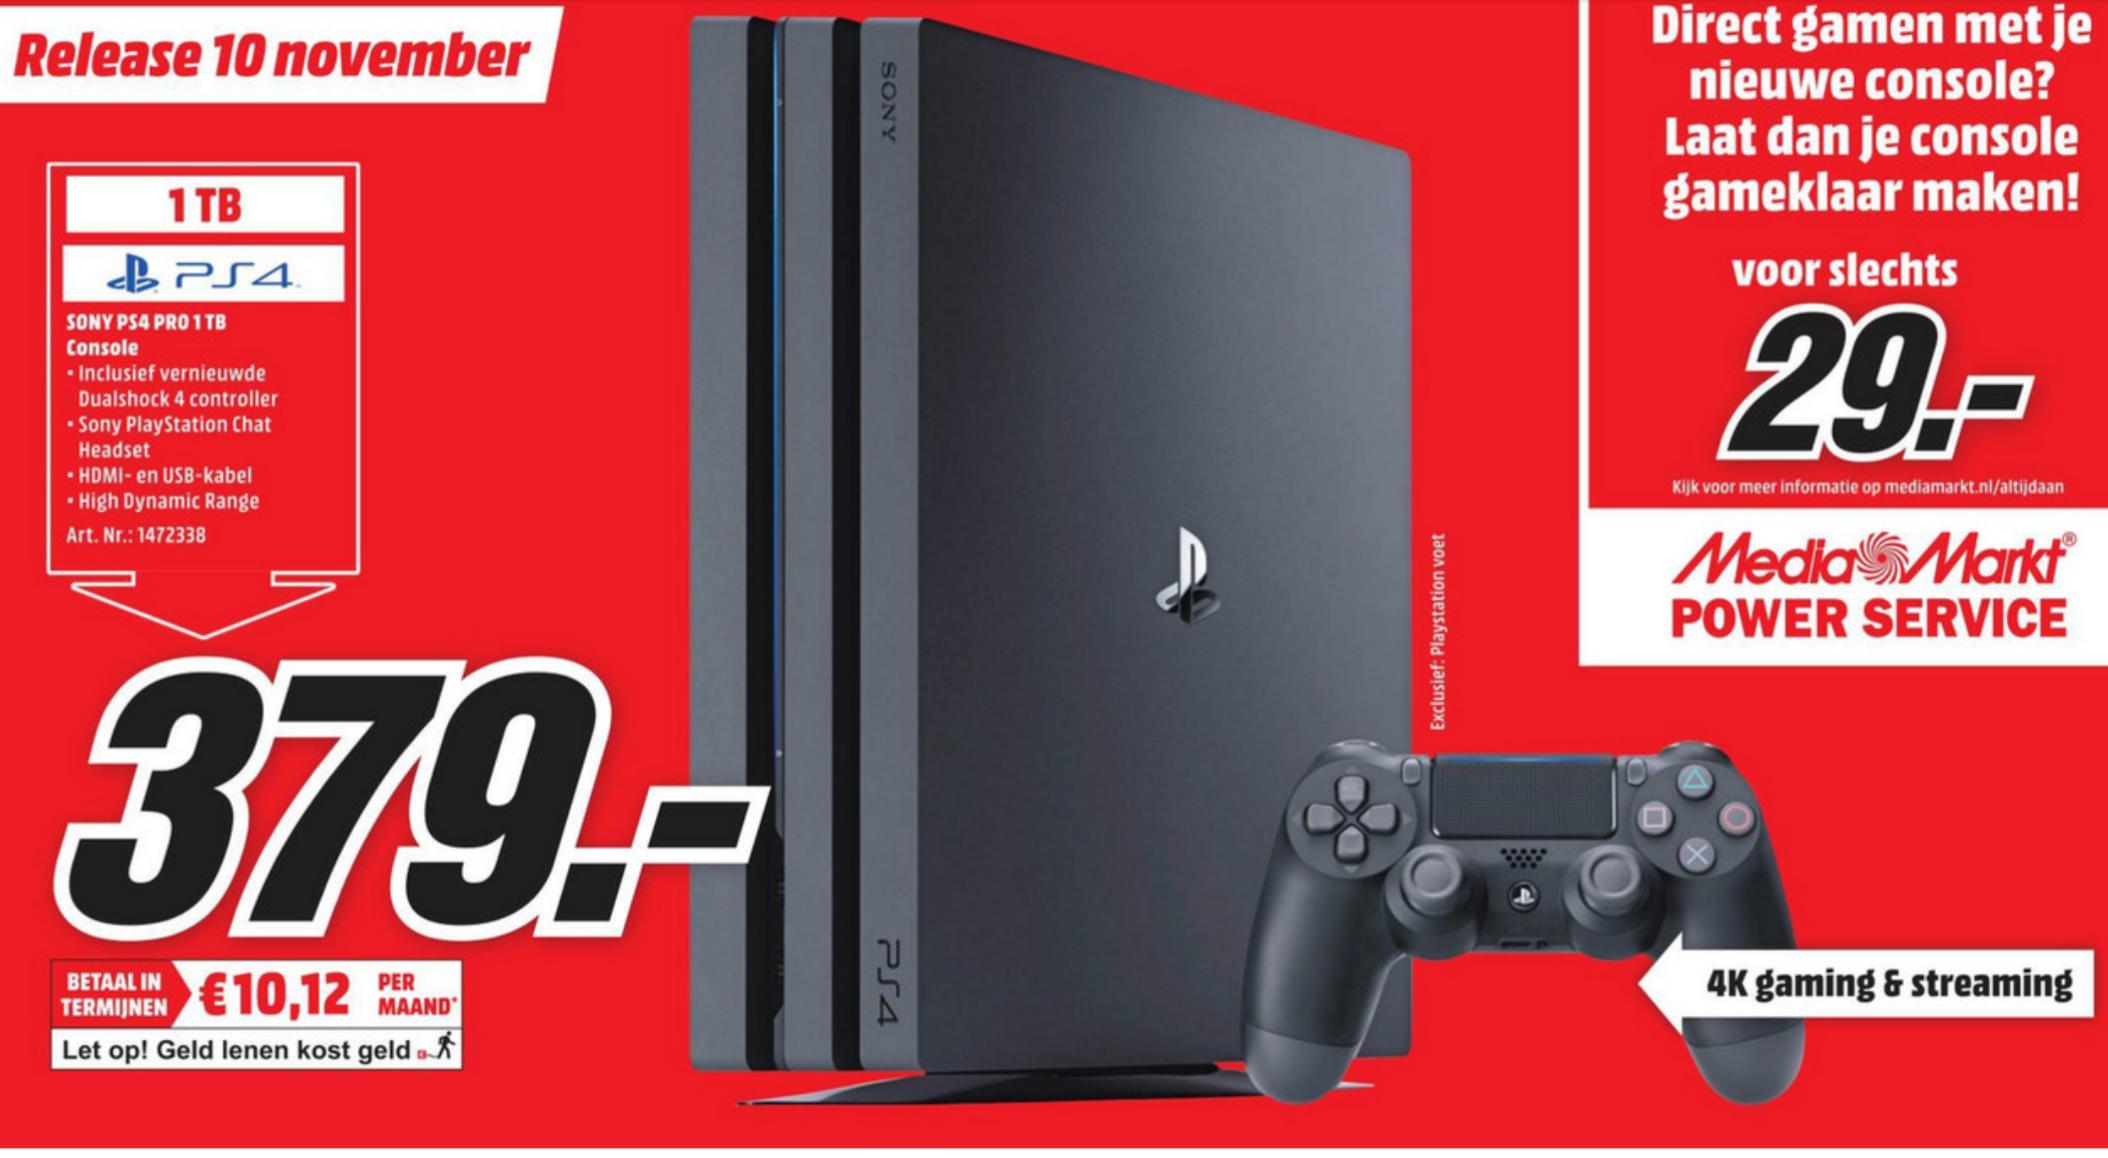 Sony PlayStation Pro 1TB - €379 [MediaMarkt/Wehkamp]